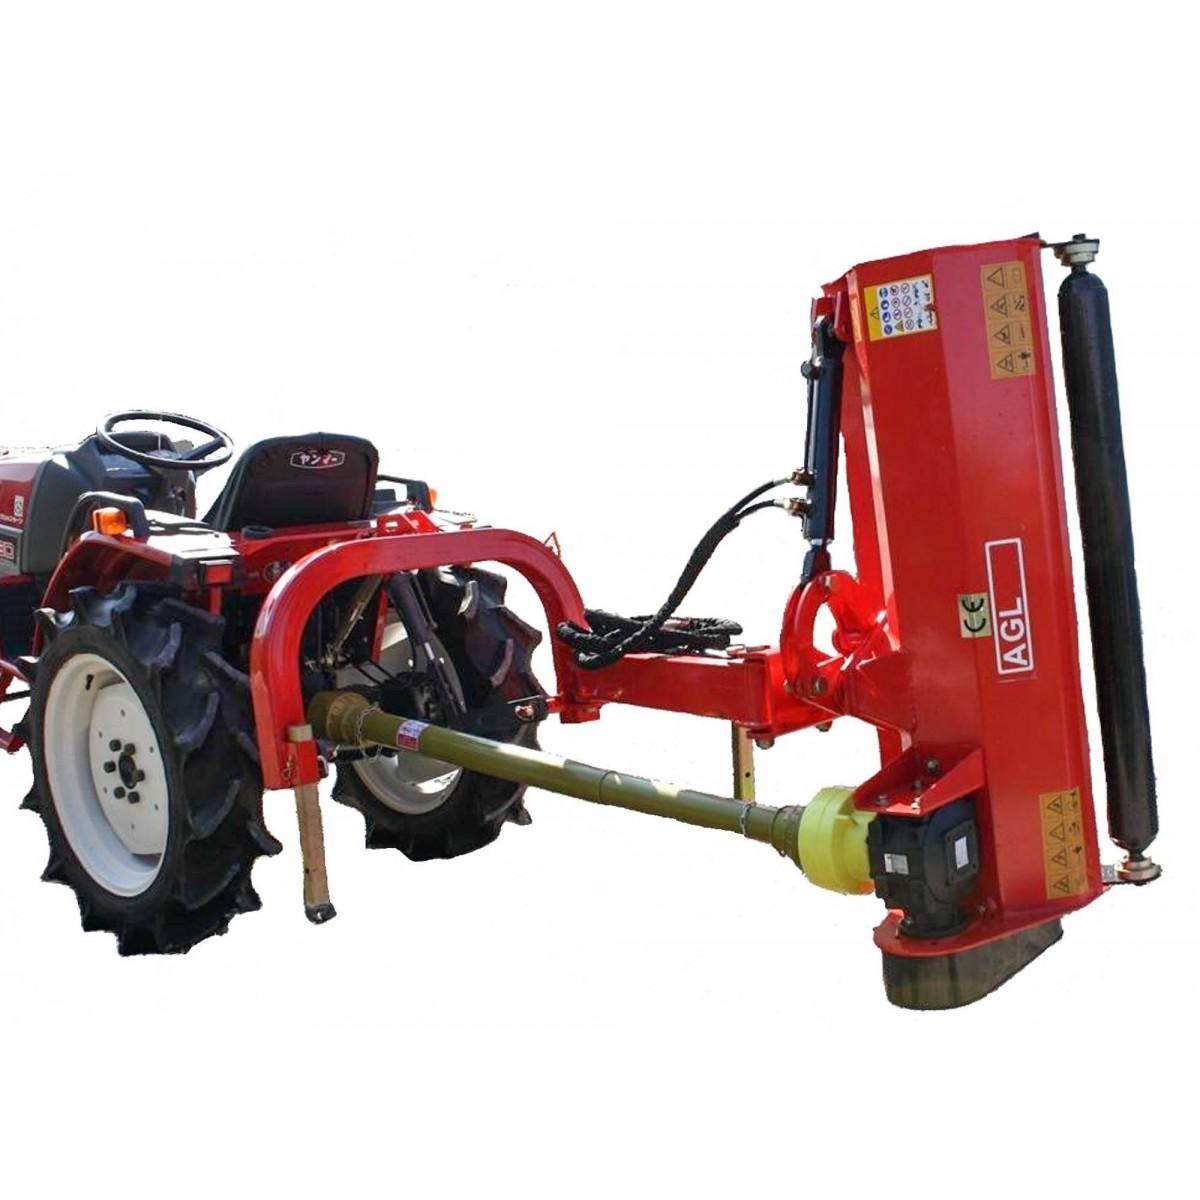 AGL 145 rear-side flail mower